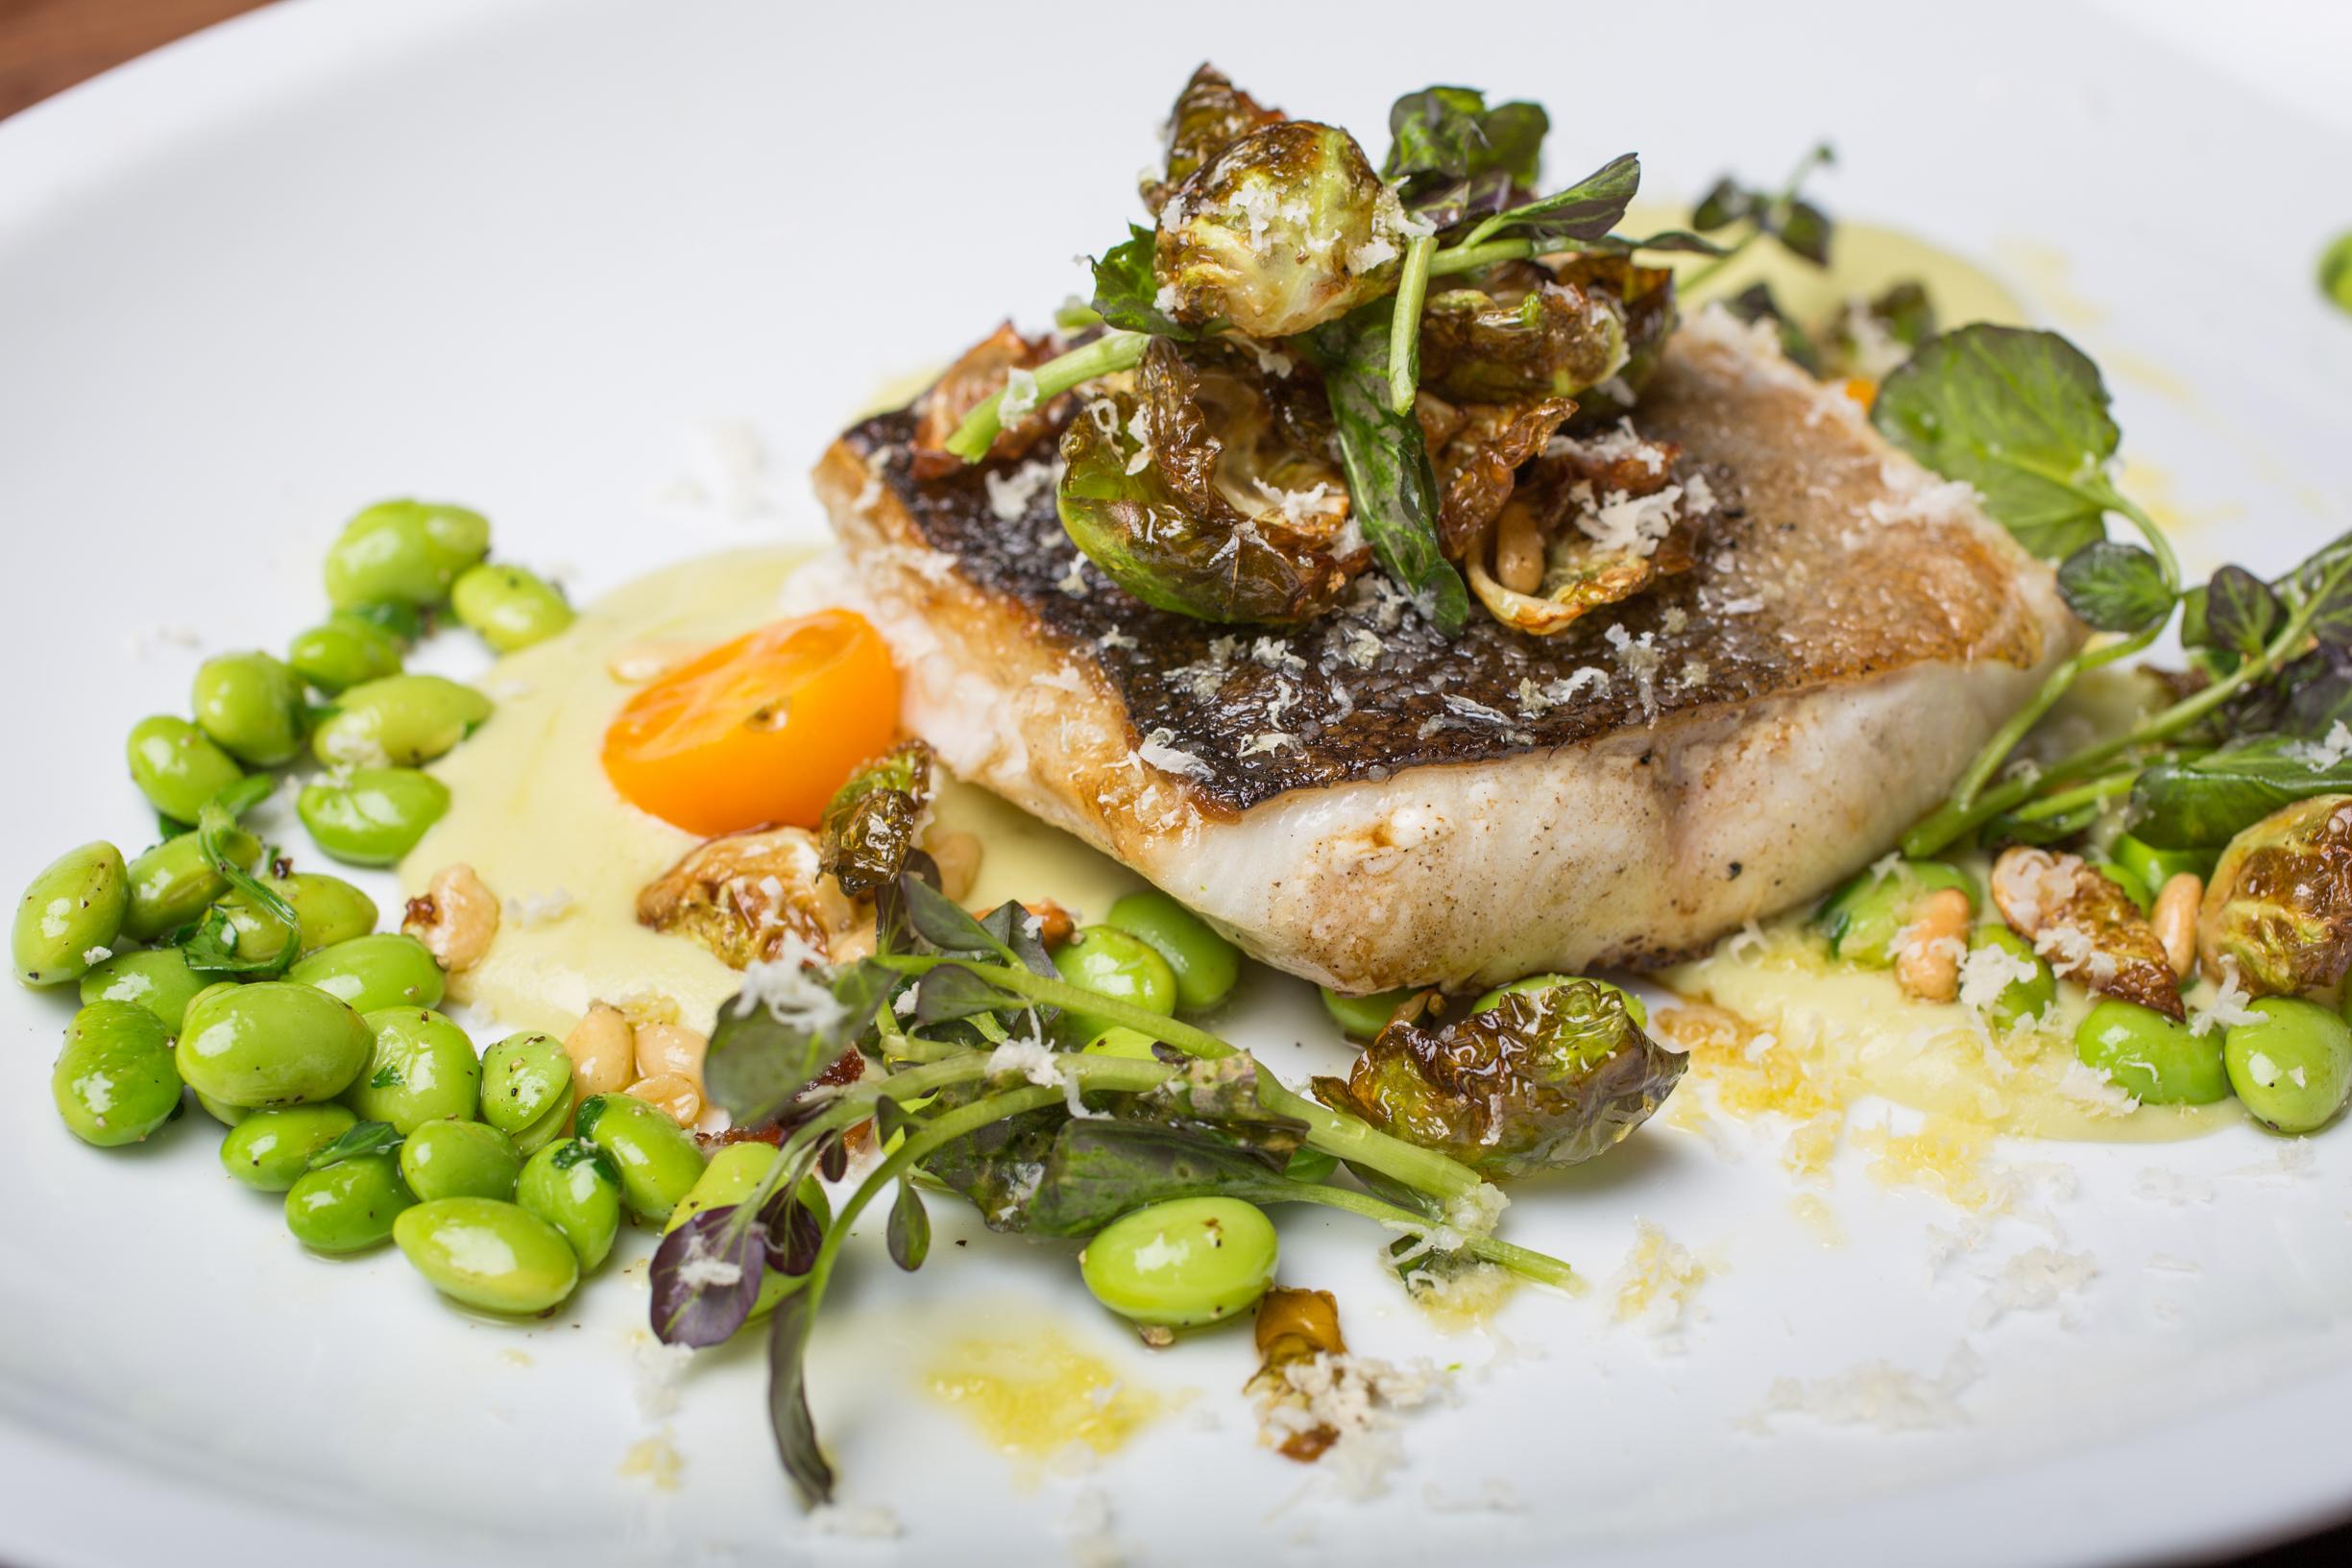 jellyfish crudo charbon restaurant vieux montreal lifestyle blog mademoiselle jules cod